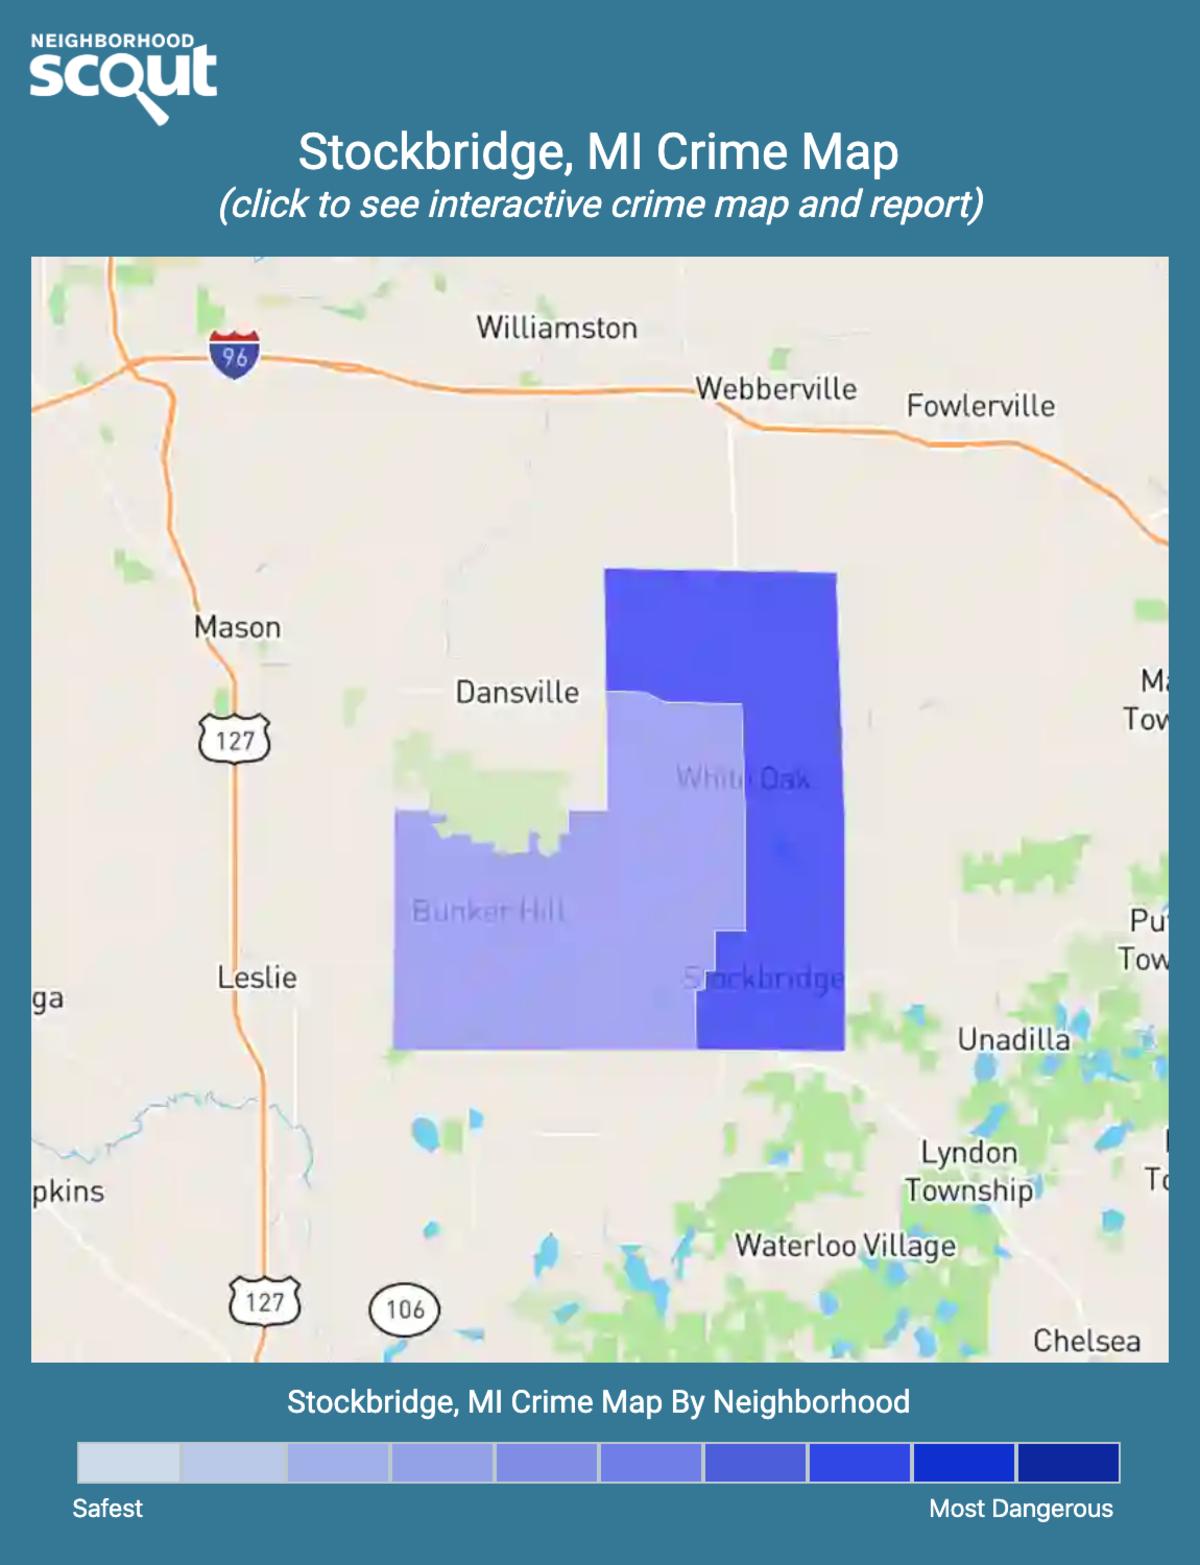 Stockbridge, Michigan crime map